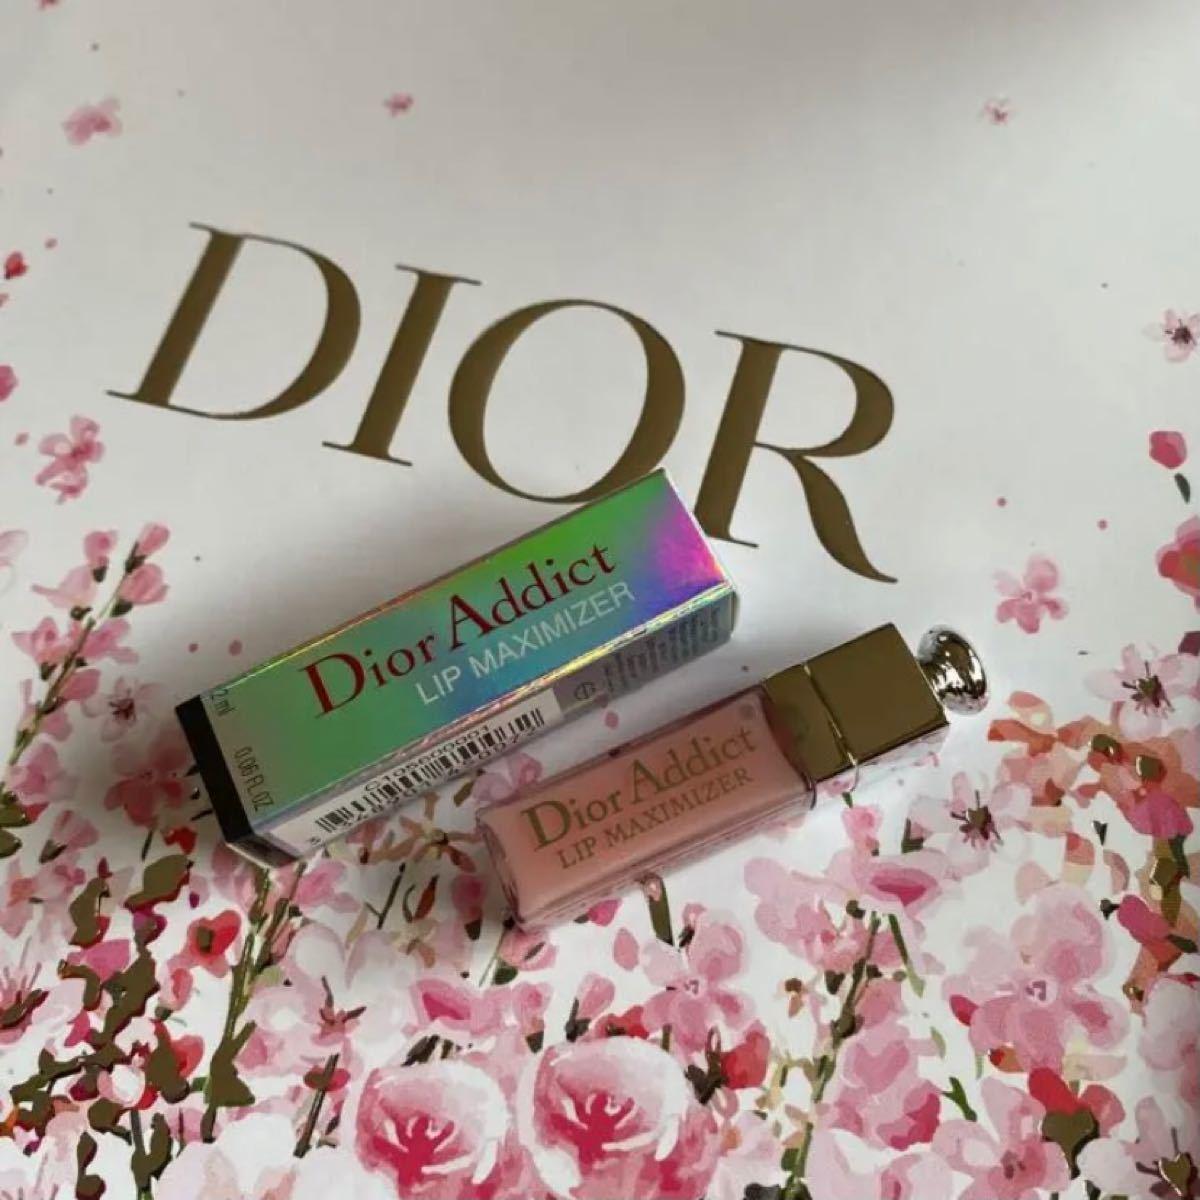 Dior ミニリップマキシマイザー 001 ピンク